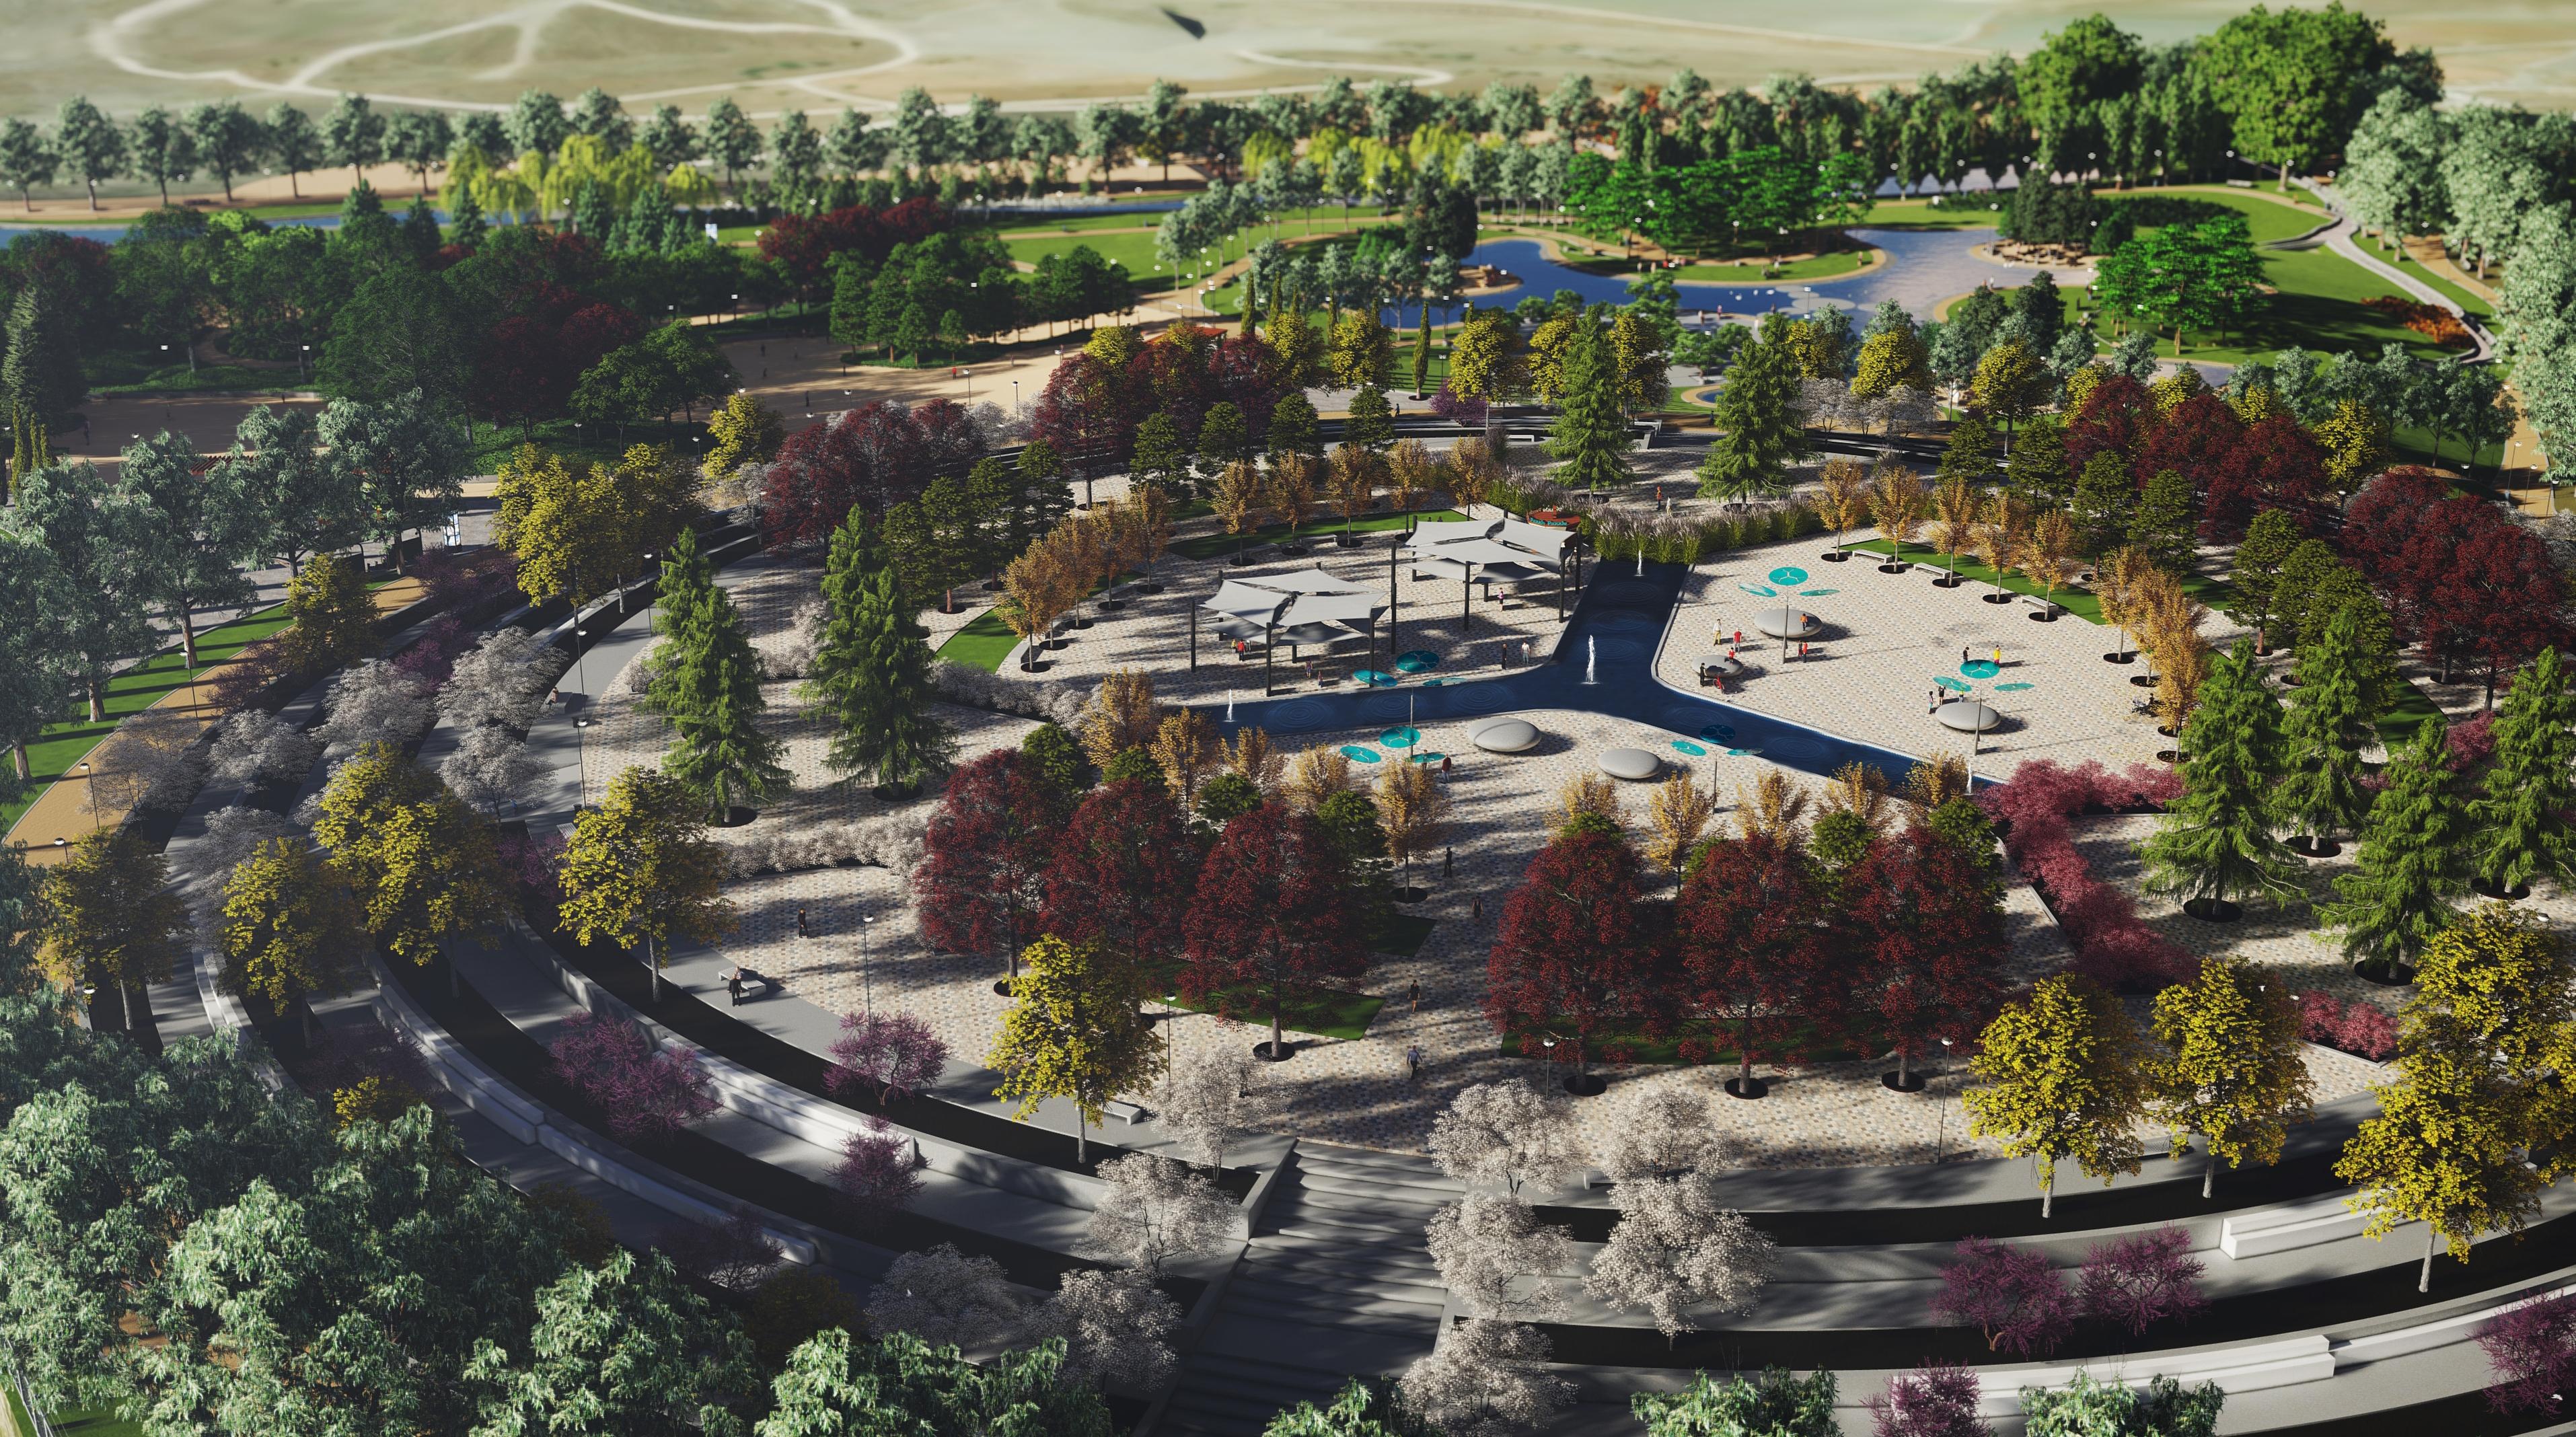 Vista de la futura Plaza del Agua